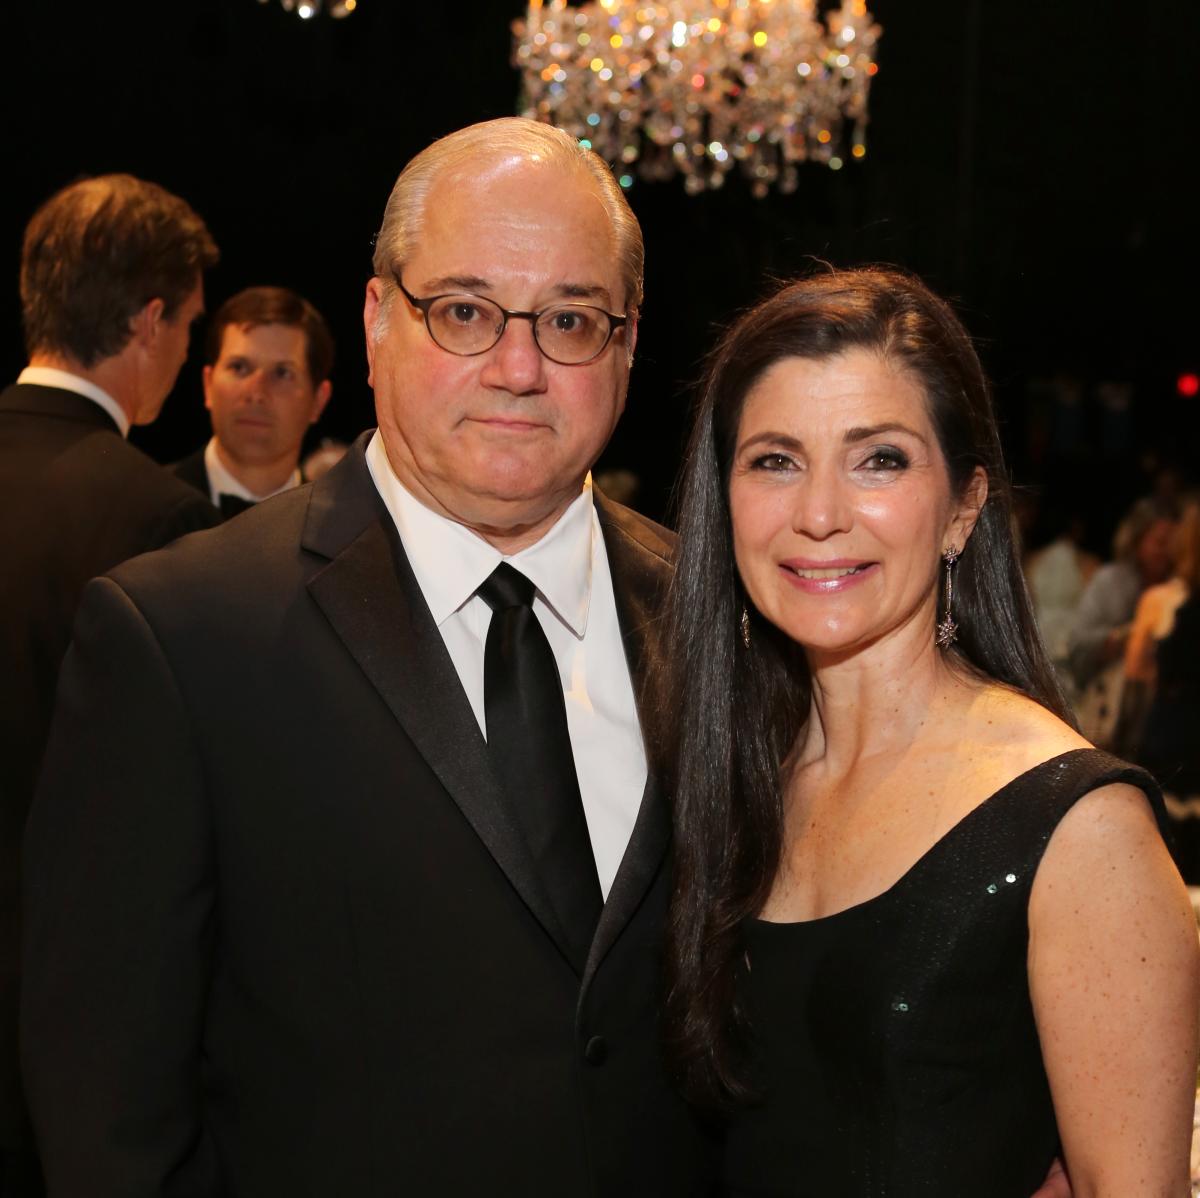 Mercury Gala, April 2016, Tony Petrello, Cynthia Petrello